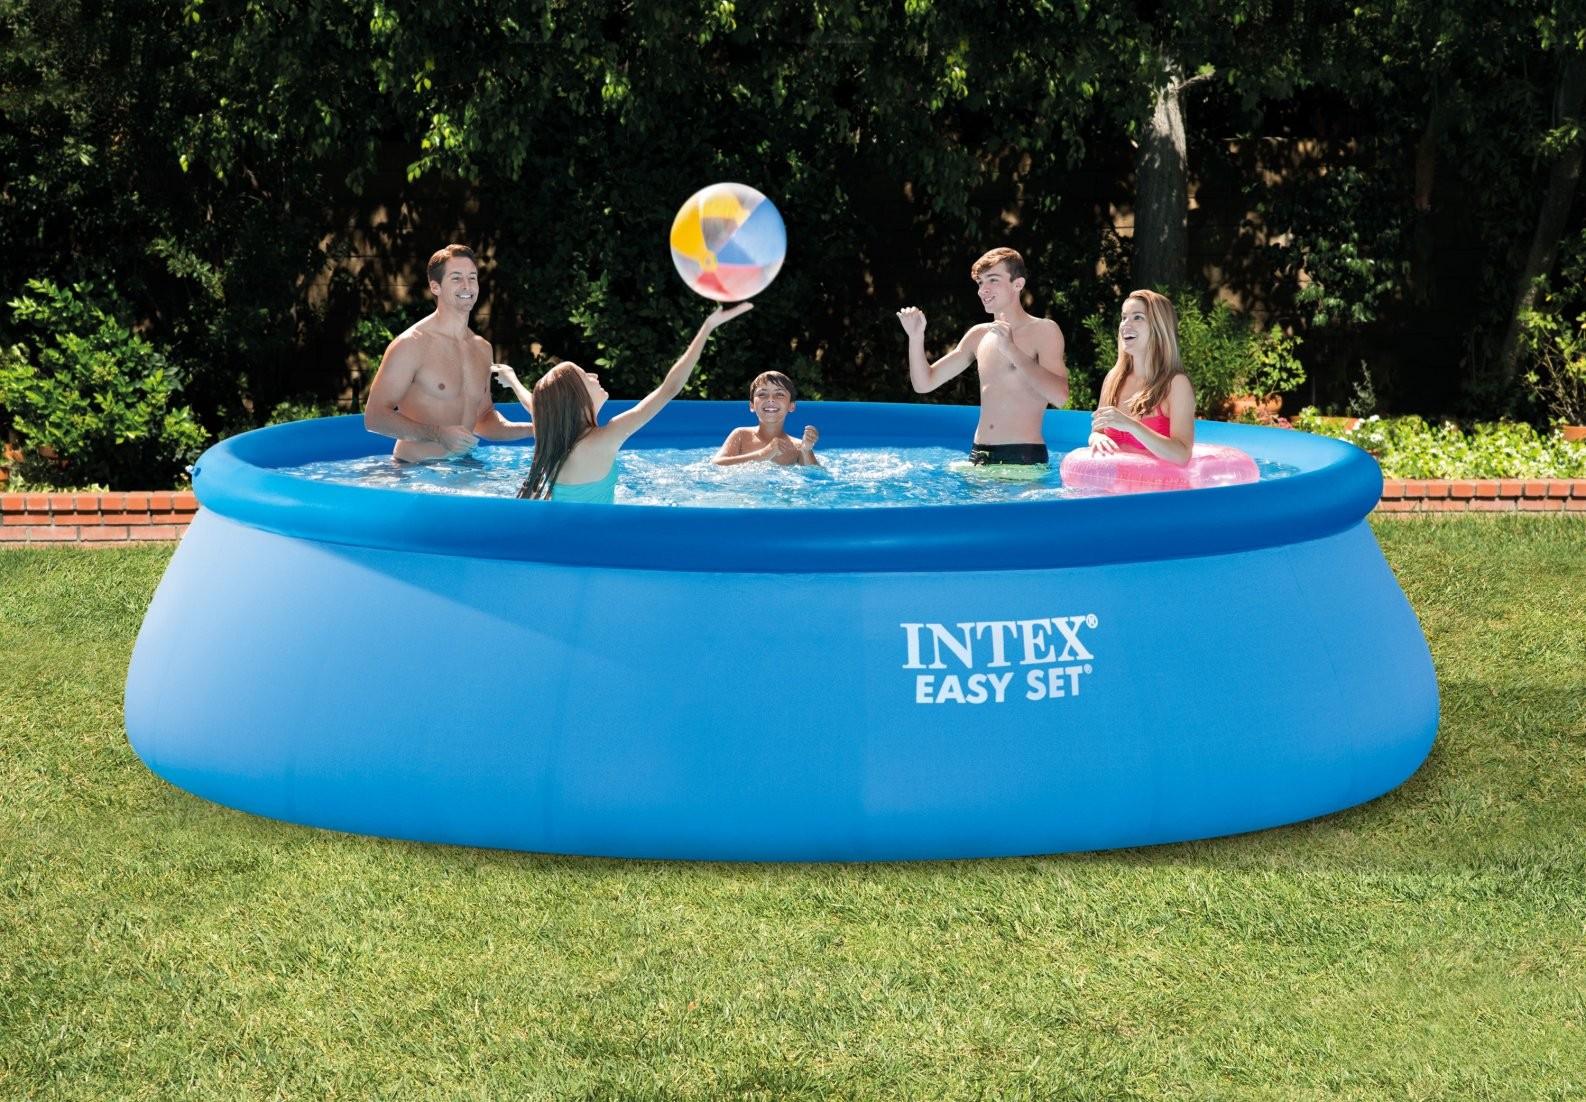 Intex 28166 piscina easy rotonda tonda 457 x 107 cm pompa for Easy piscinas